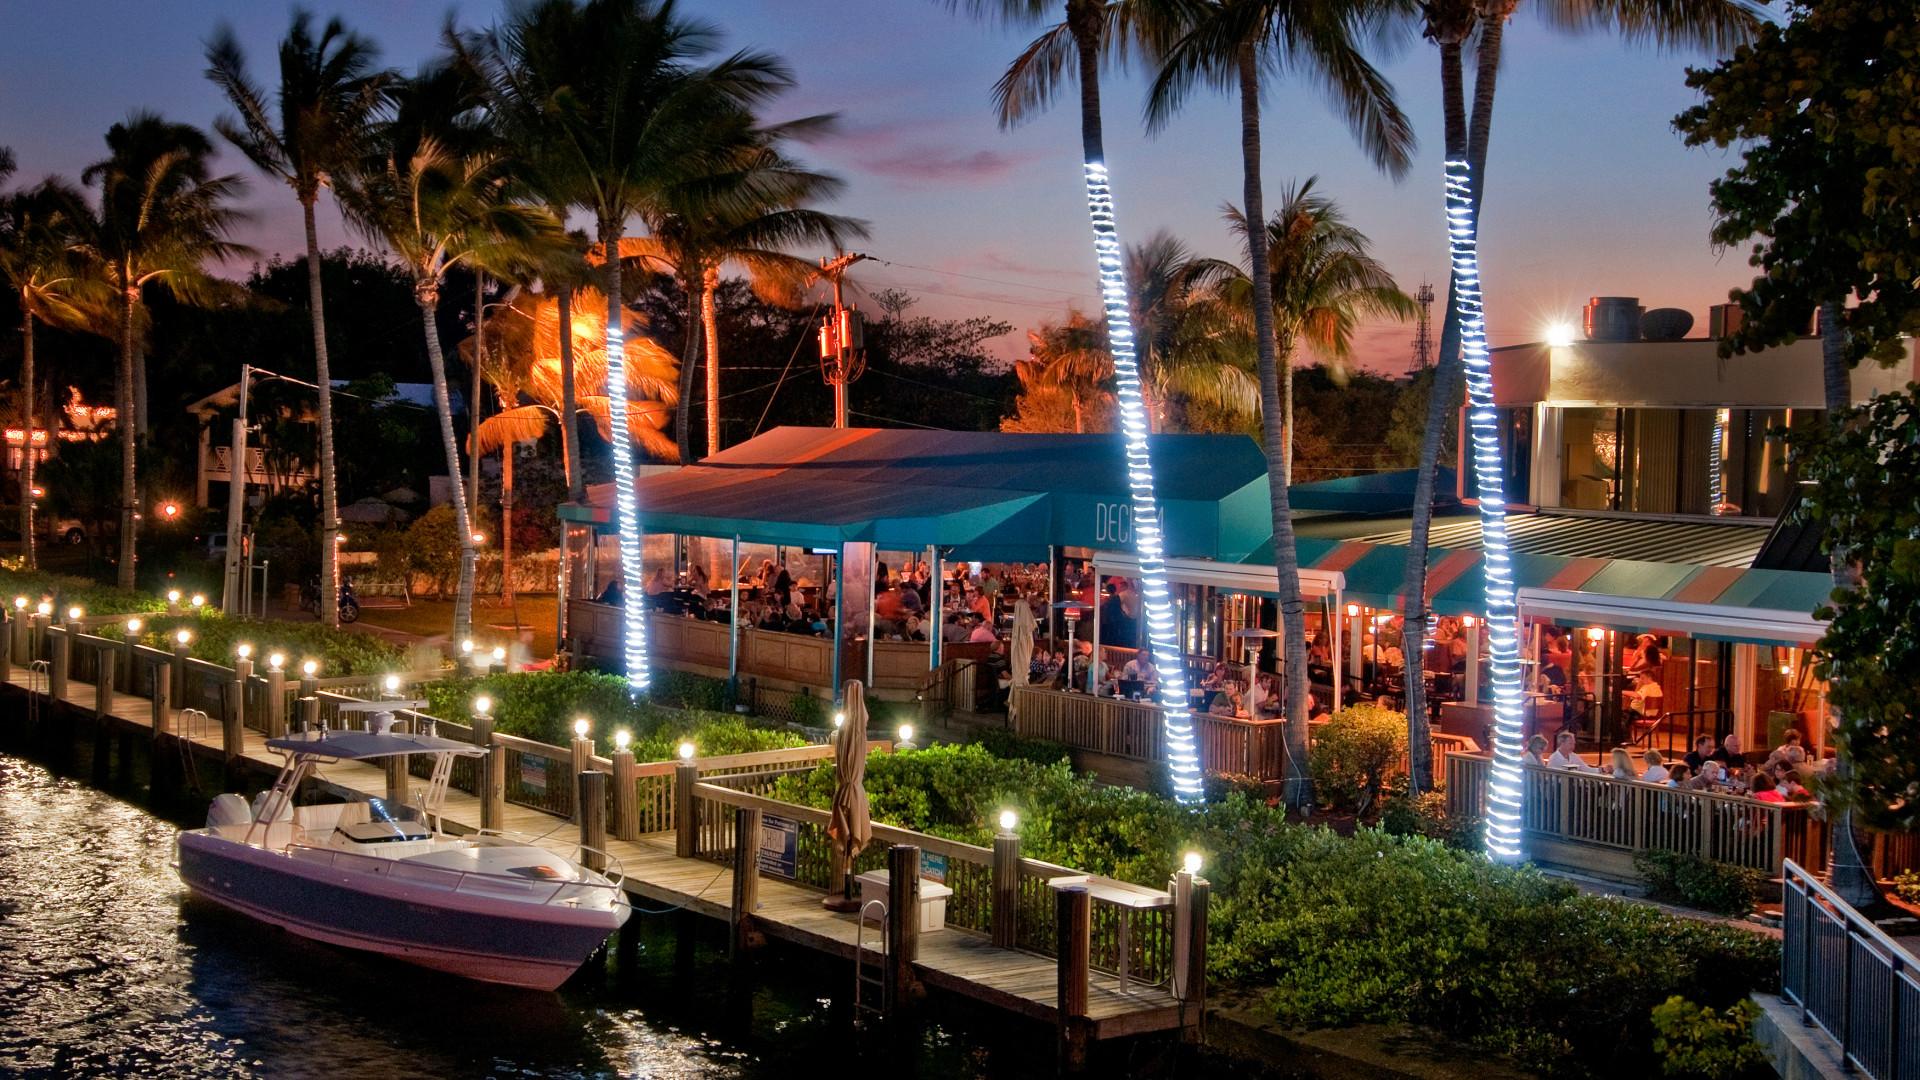 Deck 84 at The Palm Beaches